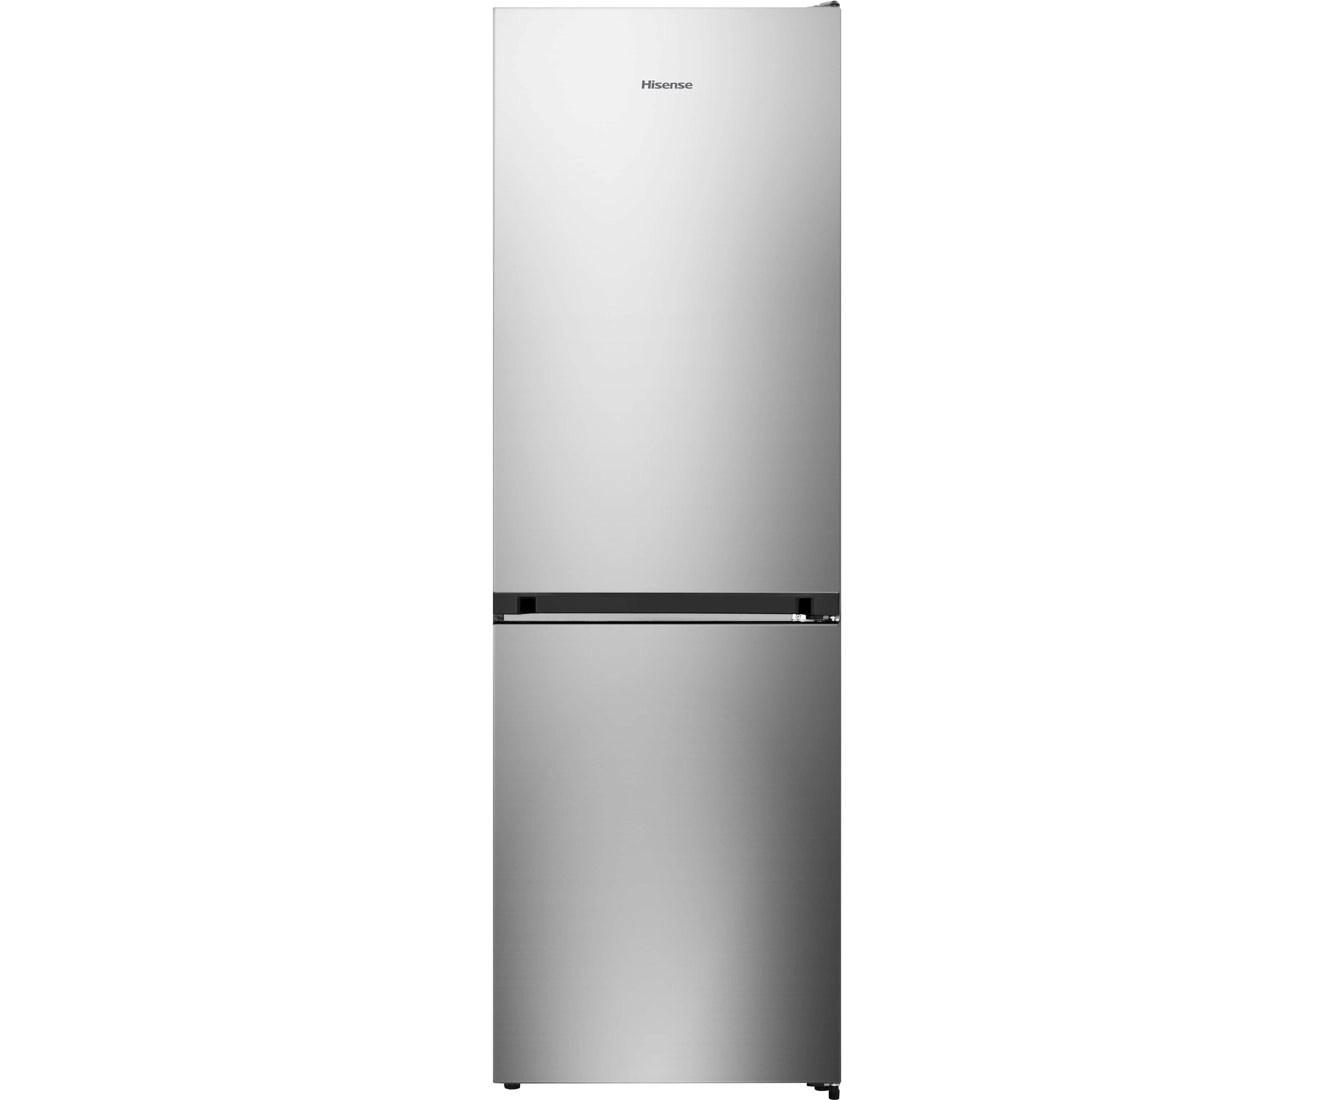 Lg Amerikanischer Kühlschrank Preis : Kühlschrank kaufen lg lg kühlschrank